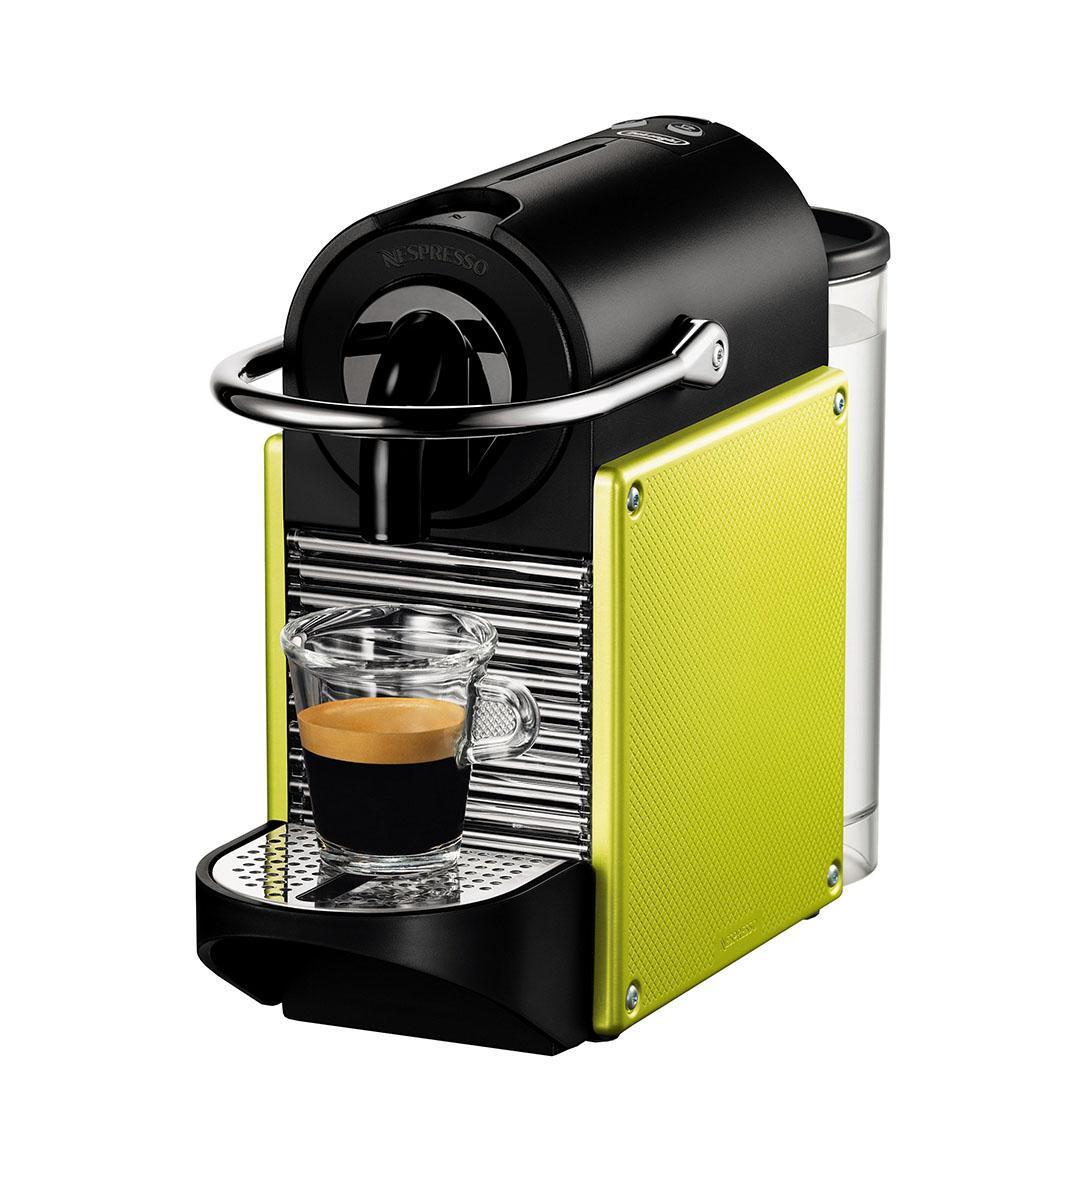 DeLonghi EN 125.L Nespresso Pixie, Green капсульная кофемашинаEN 125.L Nespresso Pixie Green